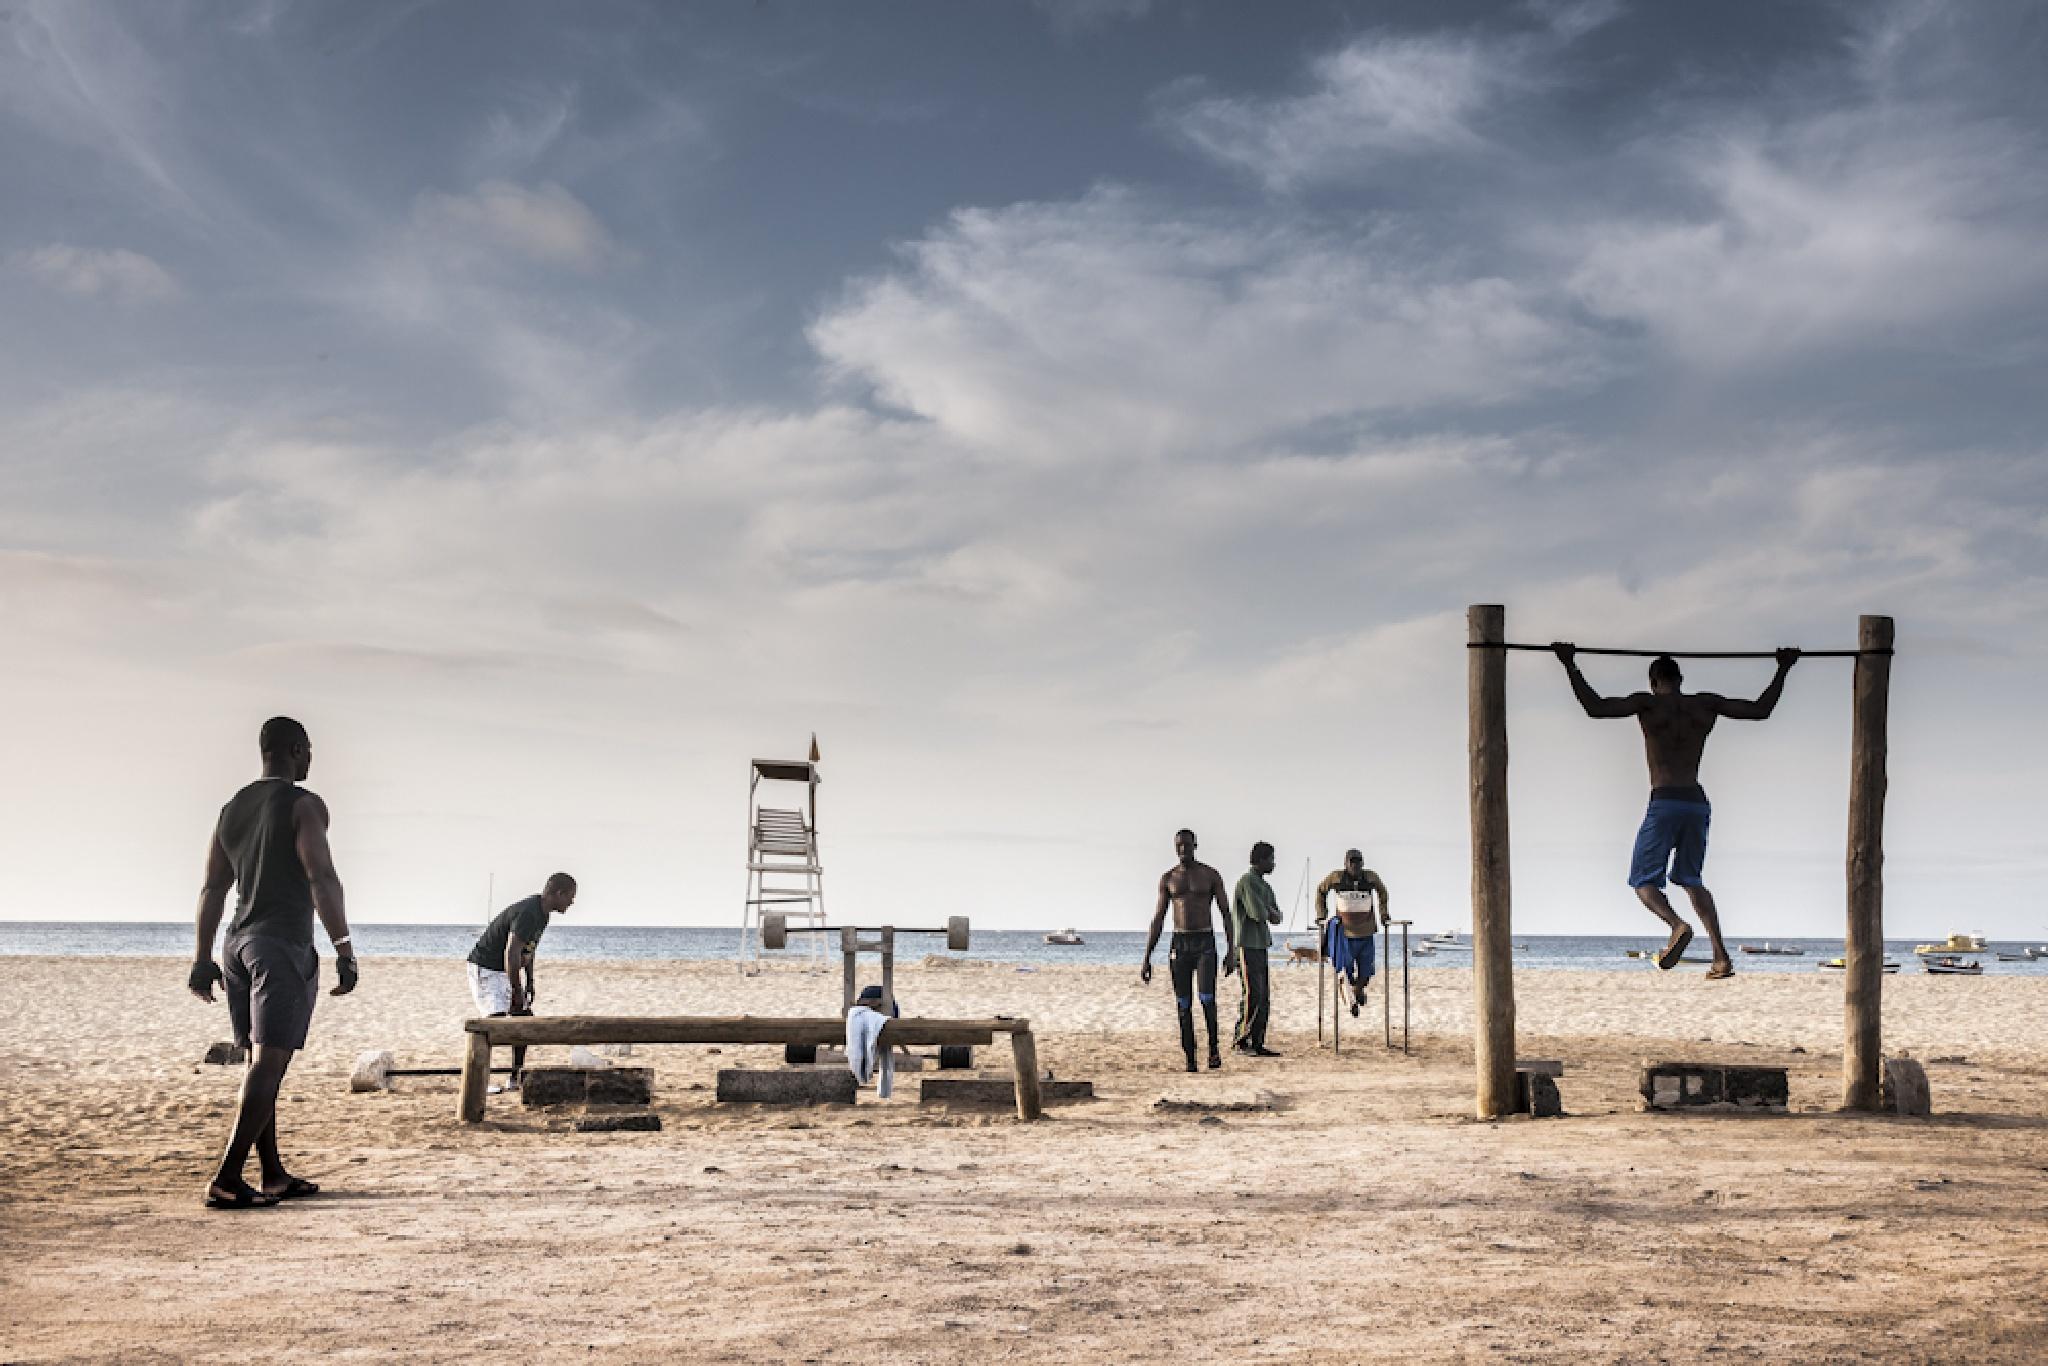 Outdoor gym, Cape Verde Island by Martin Hartley